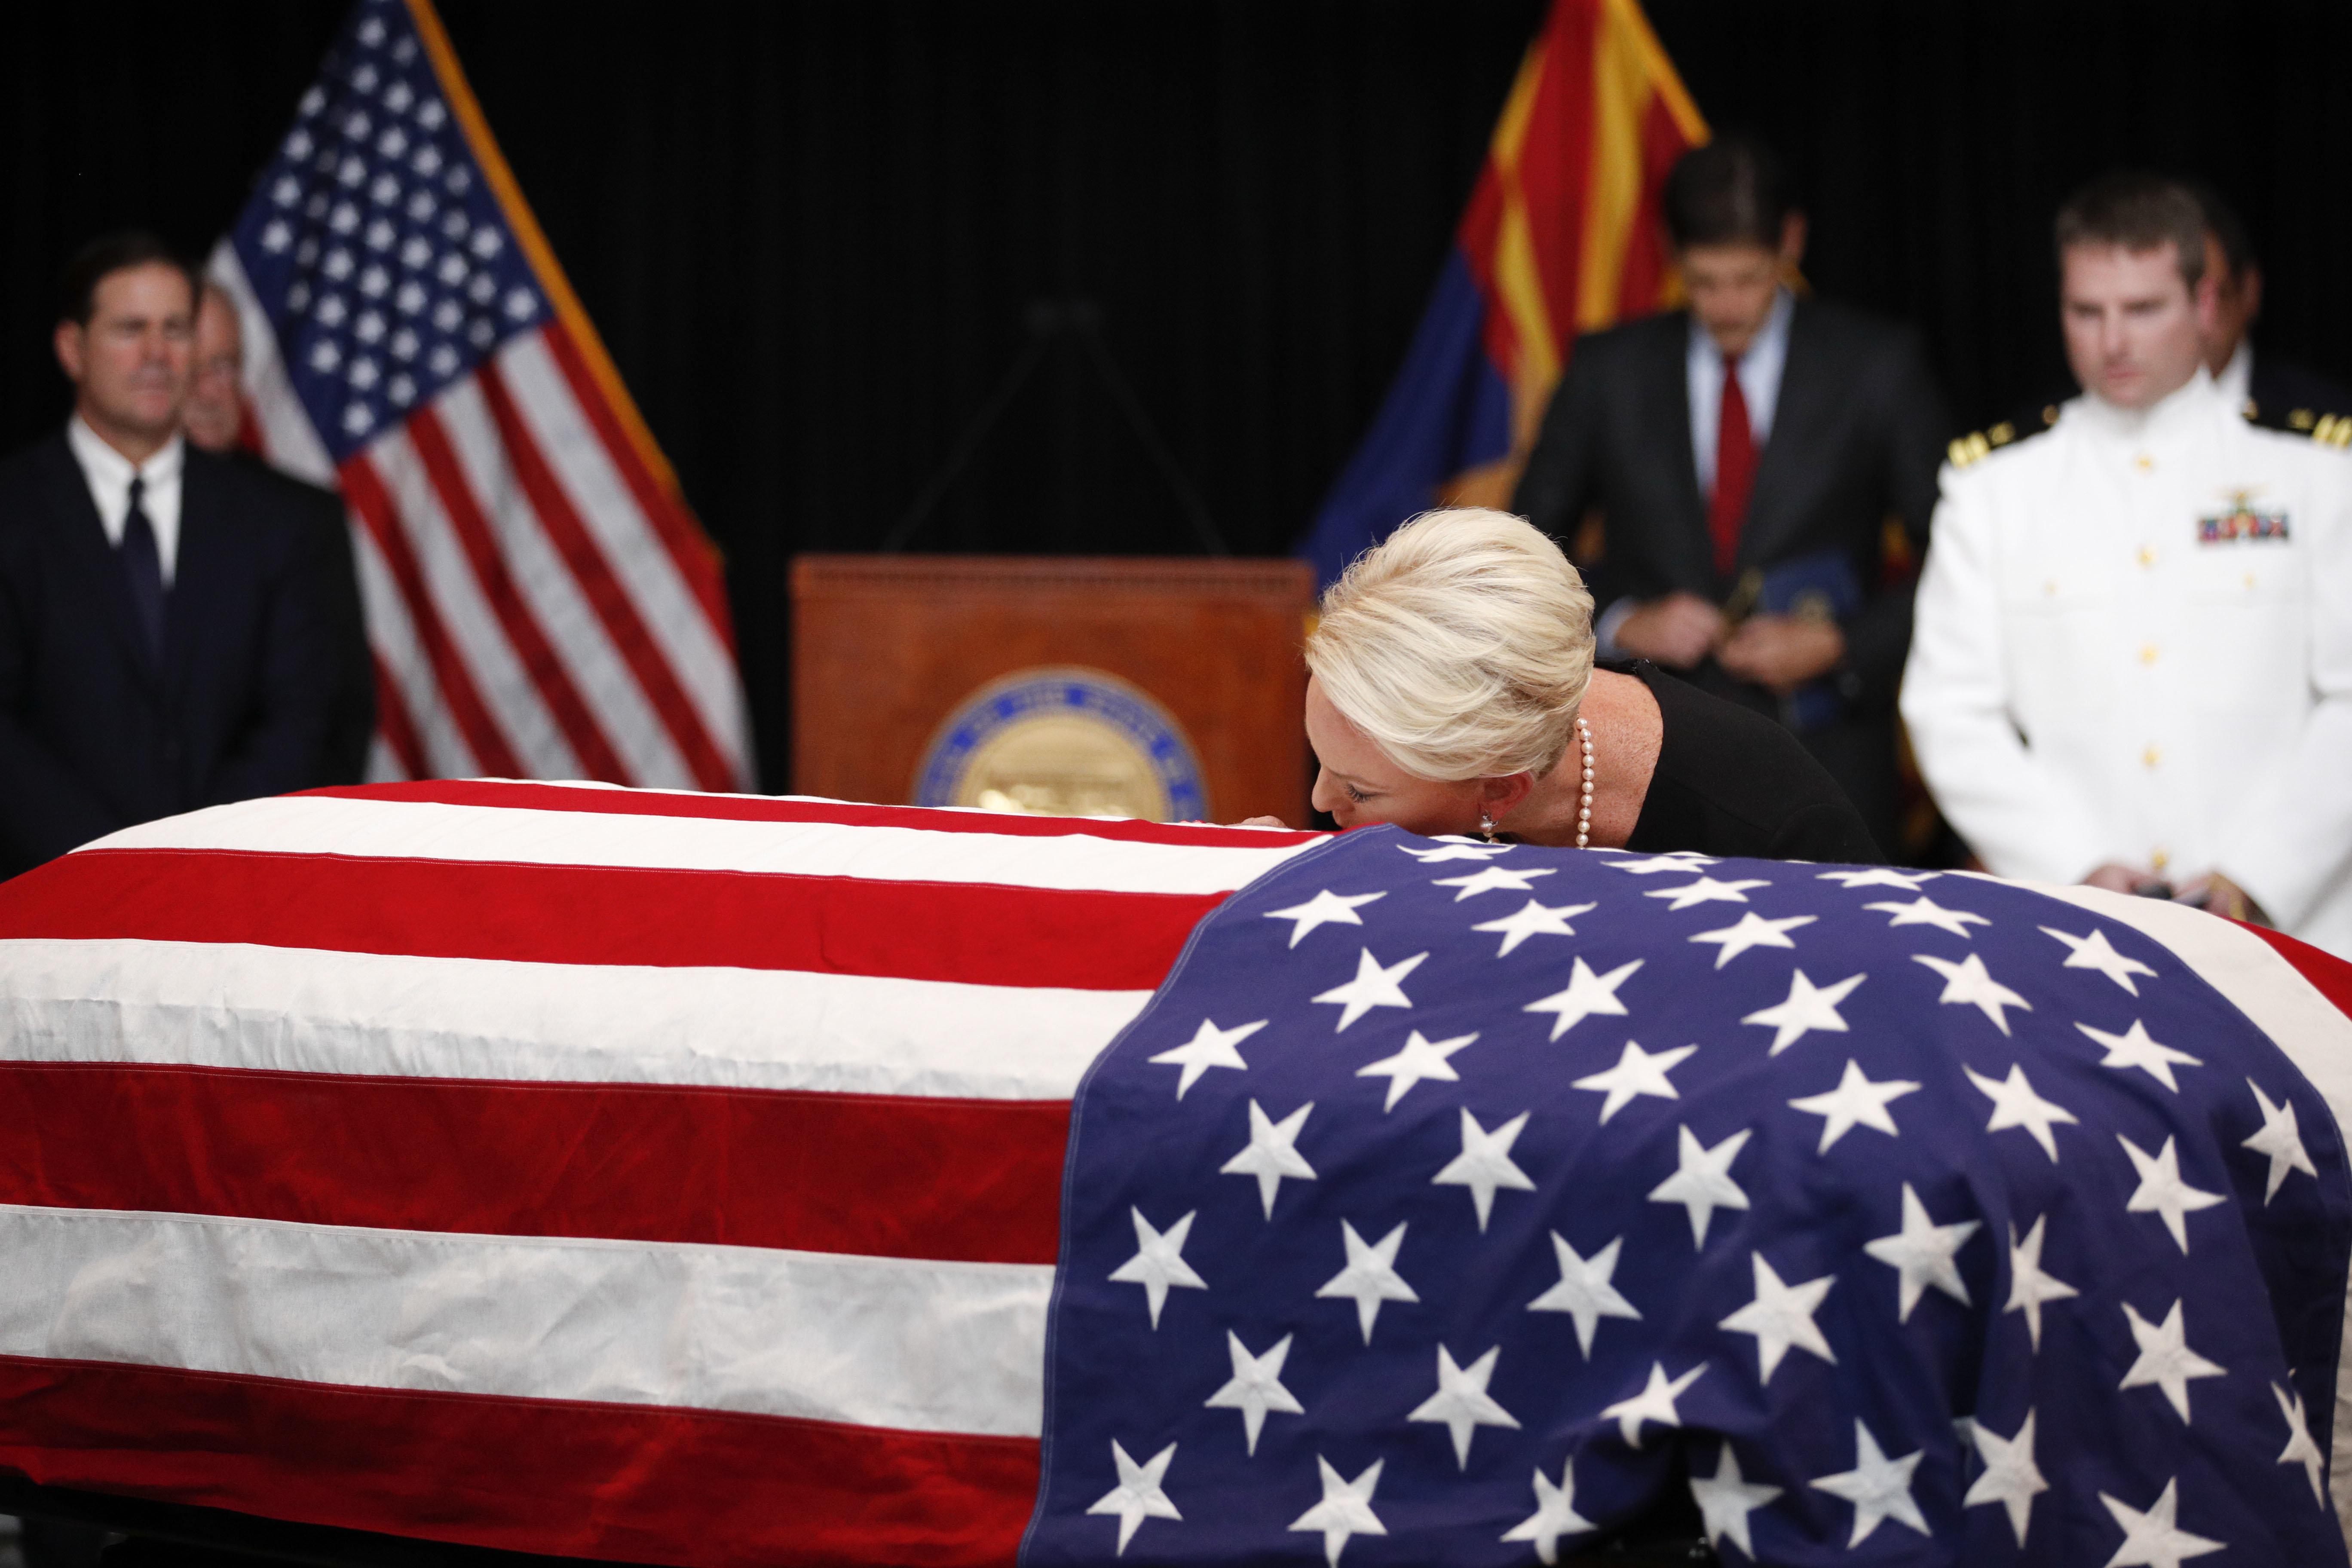 Cindy McCain Kisses Husband John McCain's Casket During Arizona